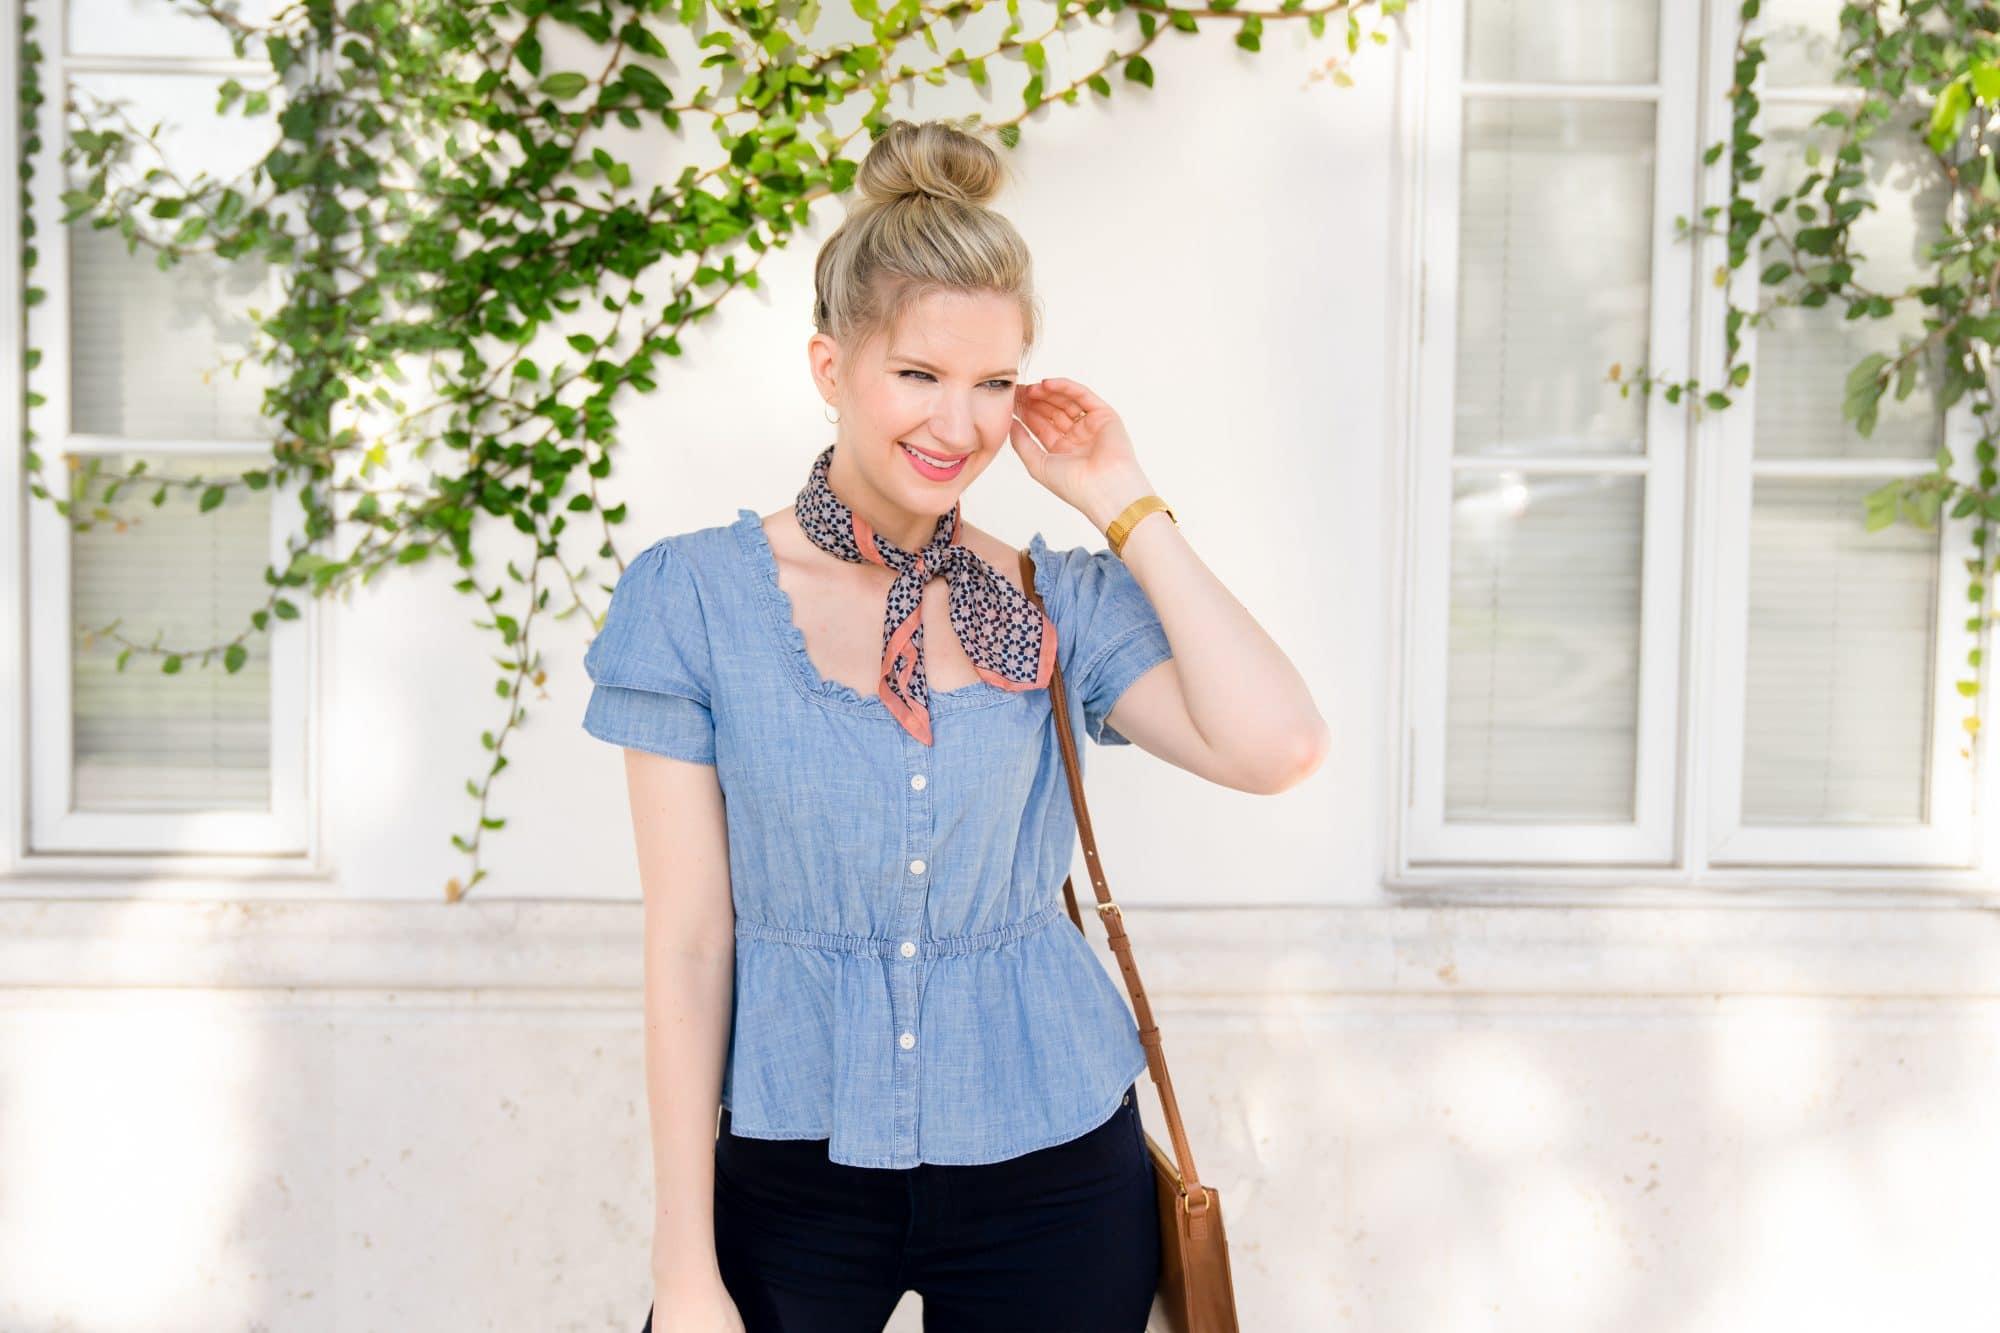 How to wear a Bandana Scarf | www.ashleybrookedesigns.com h